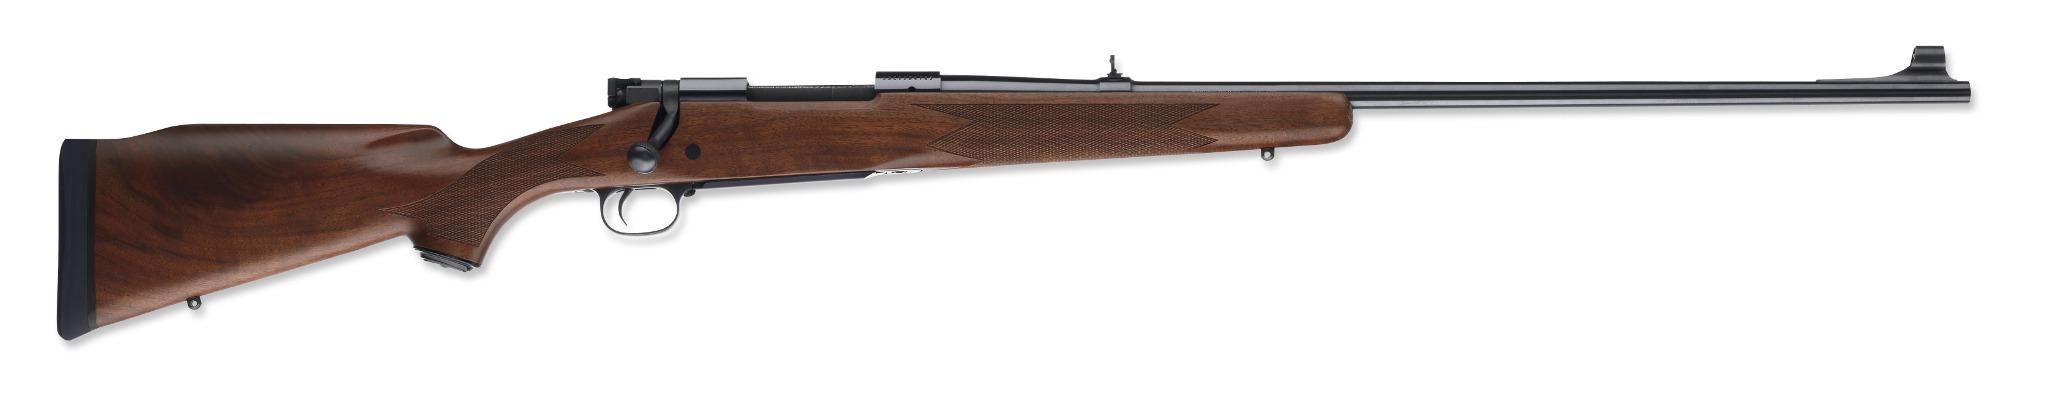 Winchester Model 70 Alaskan.